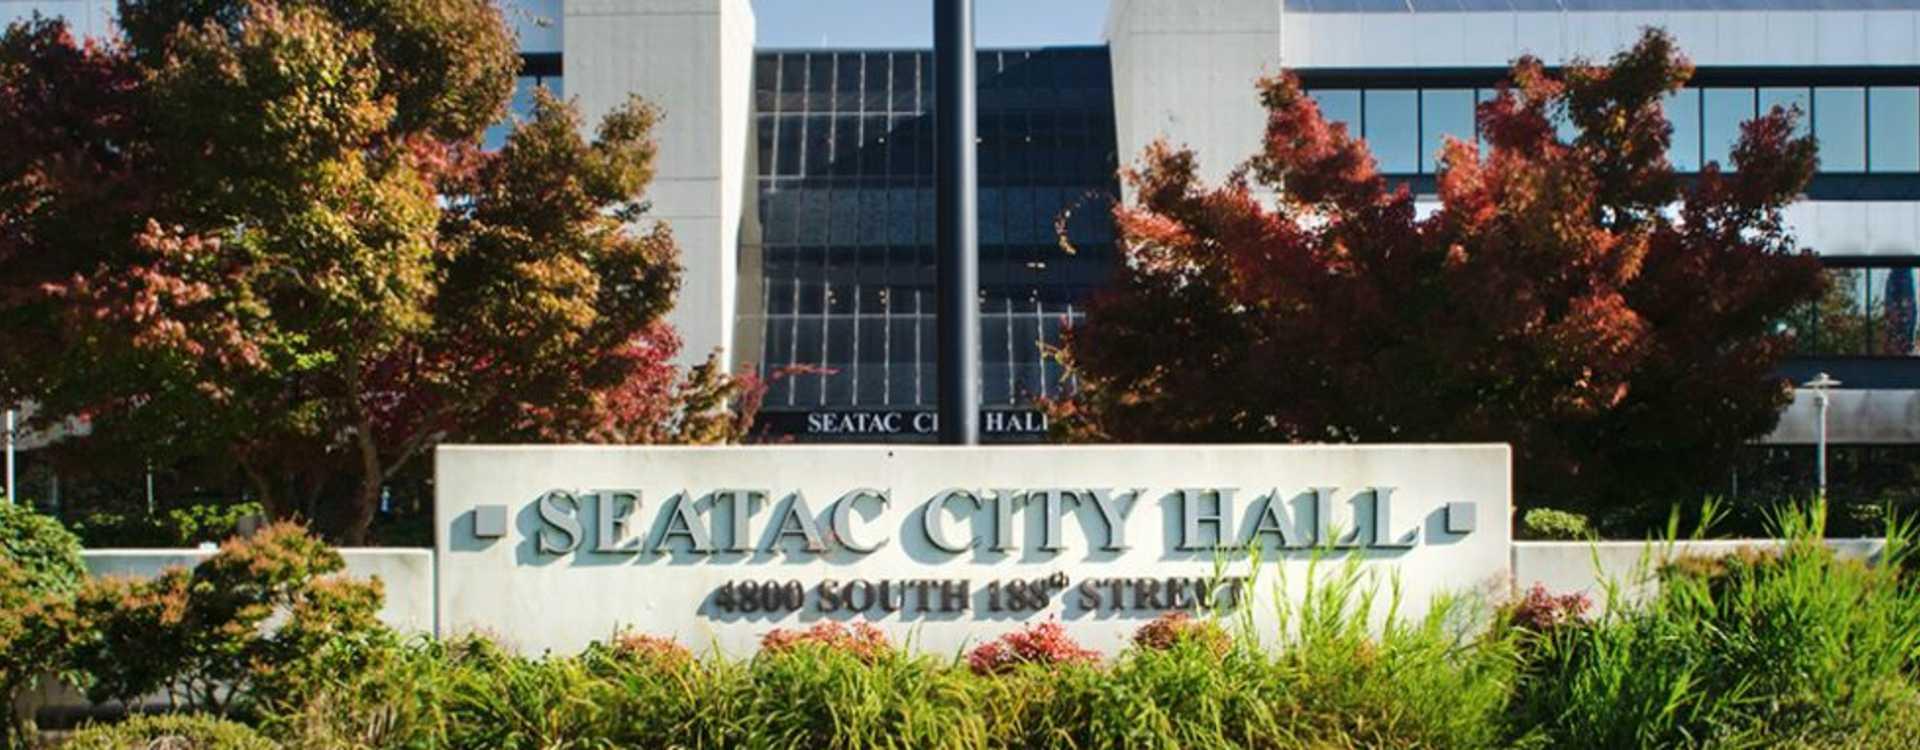 City of SeaTac City Hall